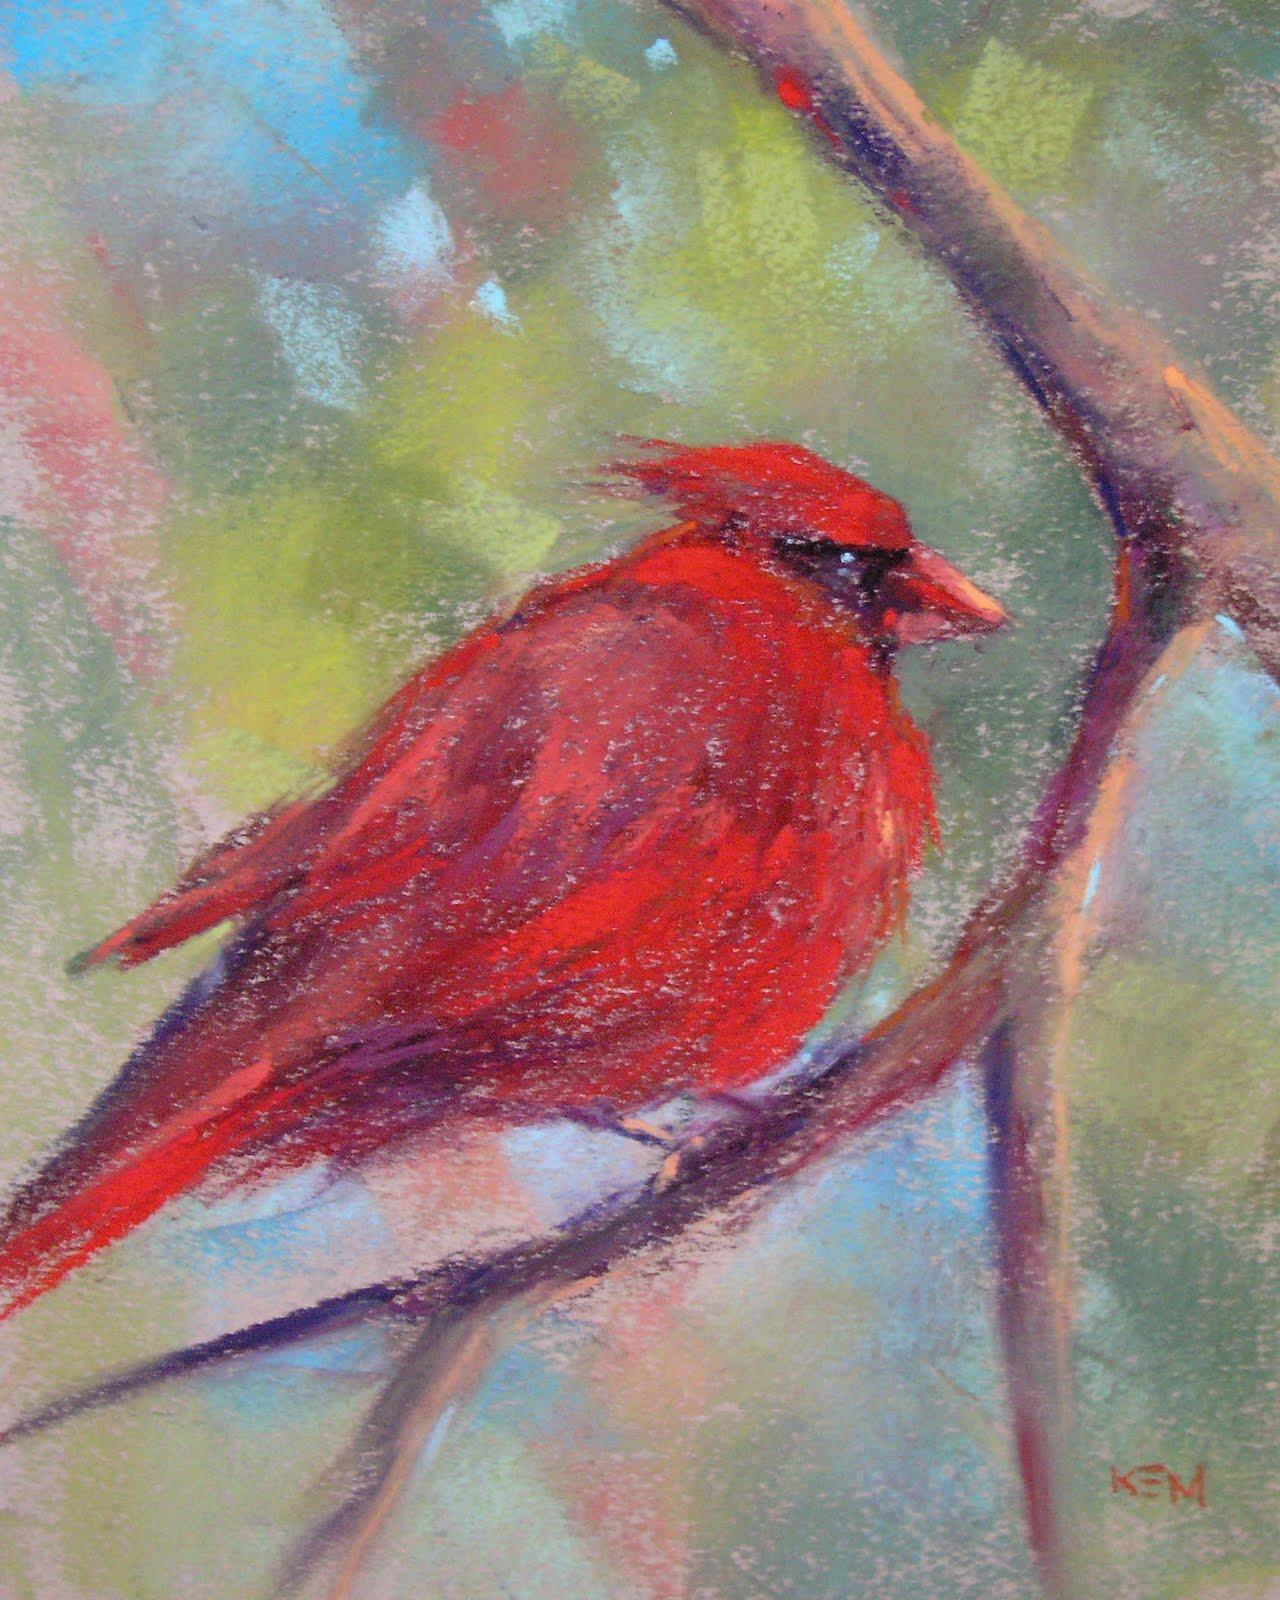 """Cardinal Pastel Study 8x10"" original fine art by Karen Margulis"